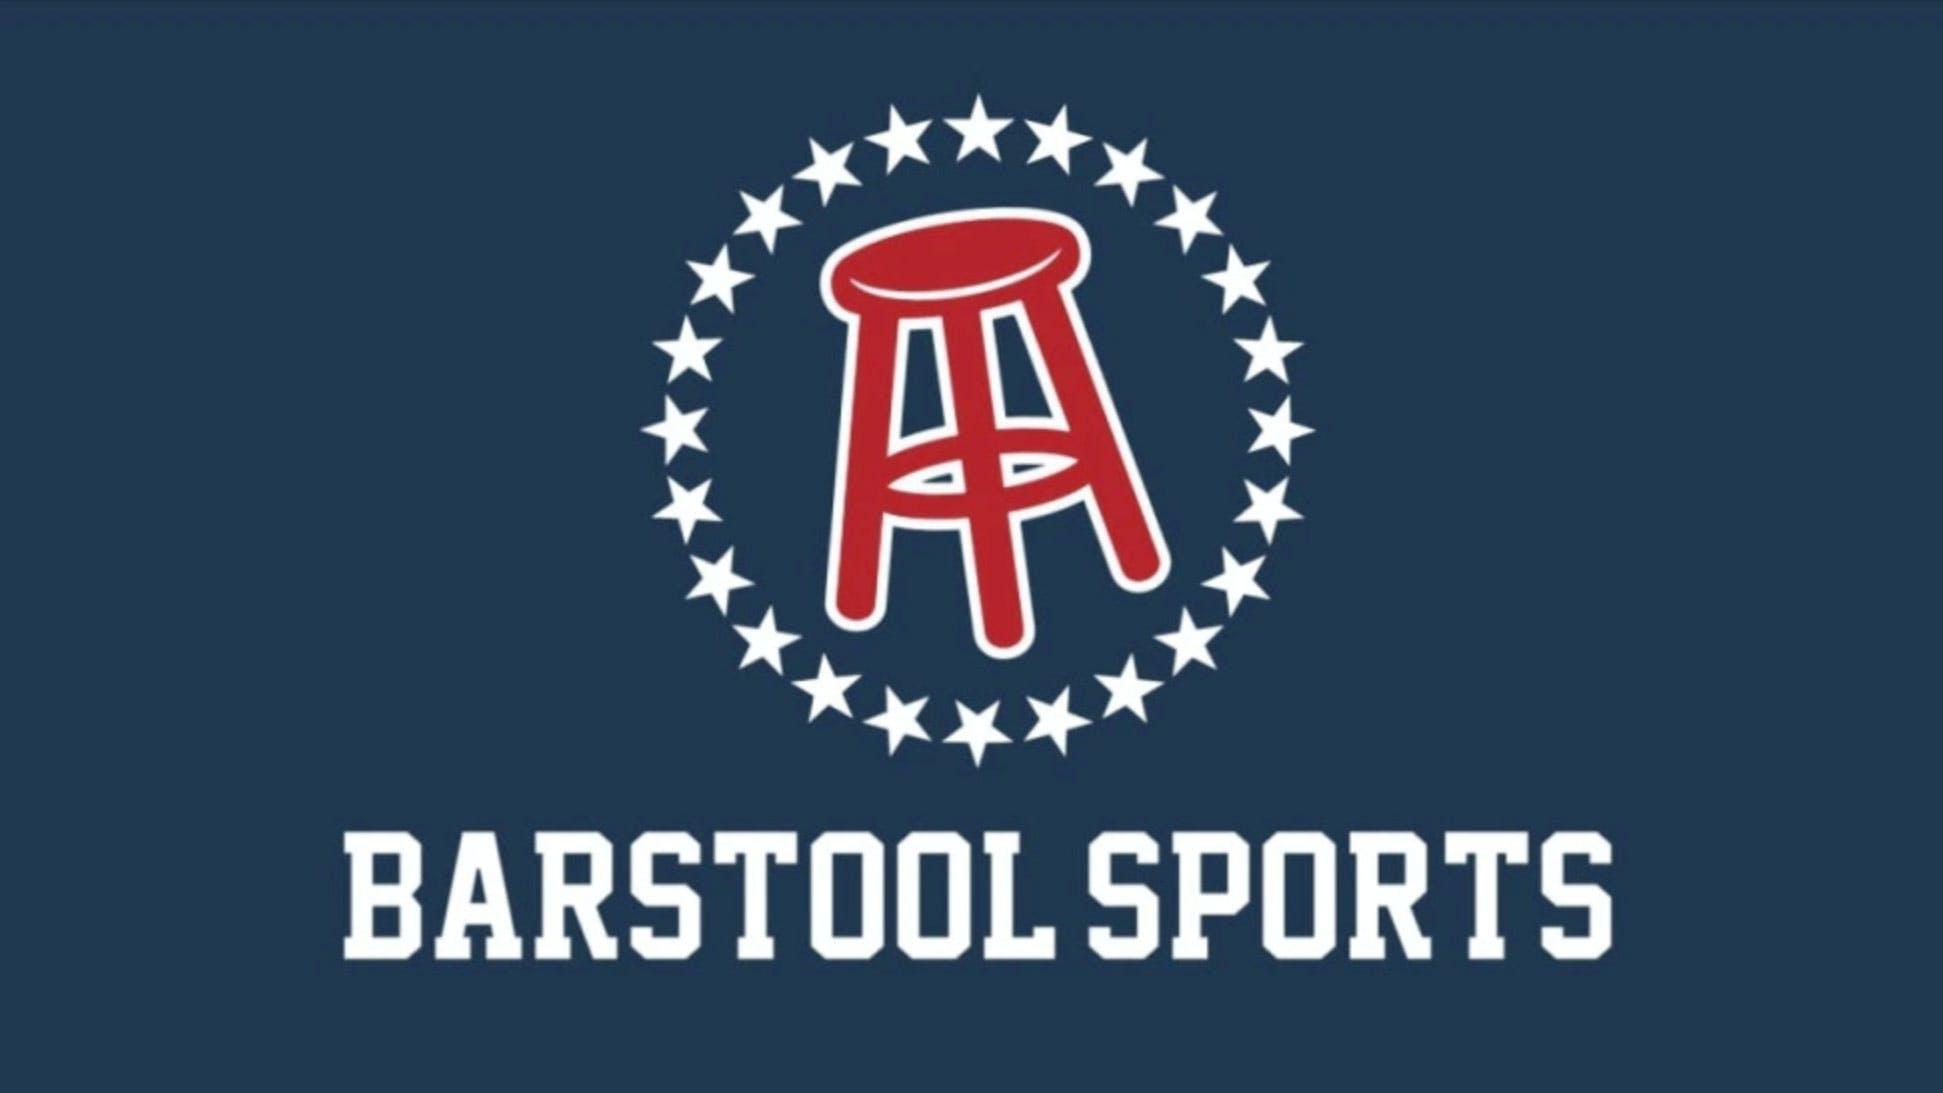 Barstool Sportsbook App Download